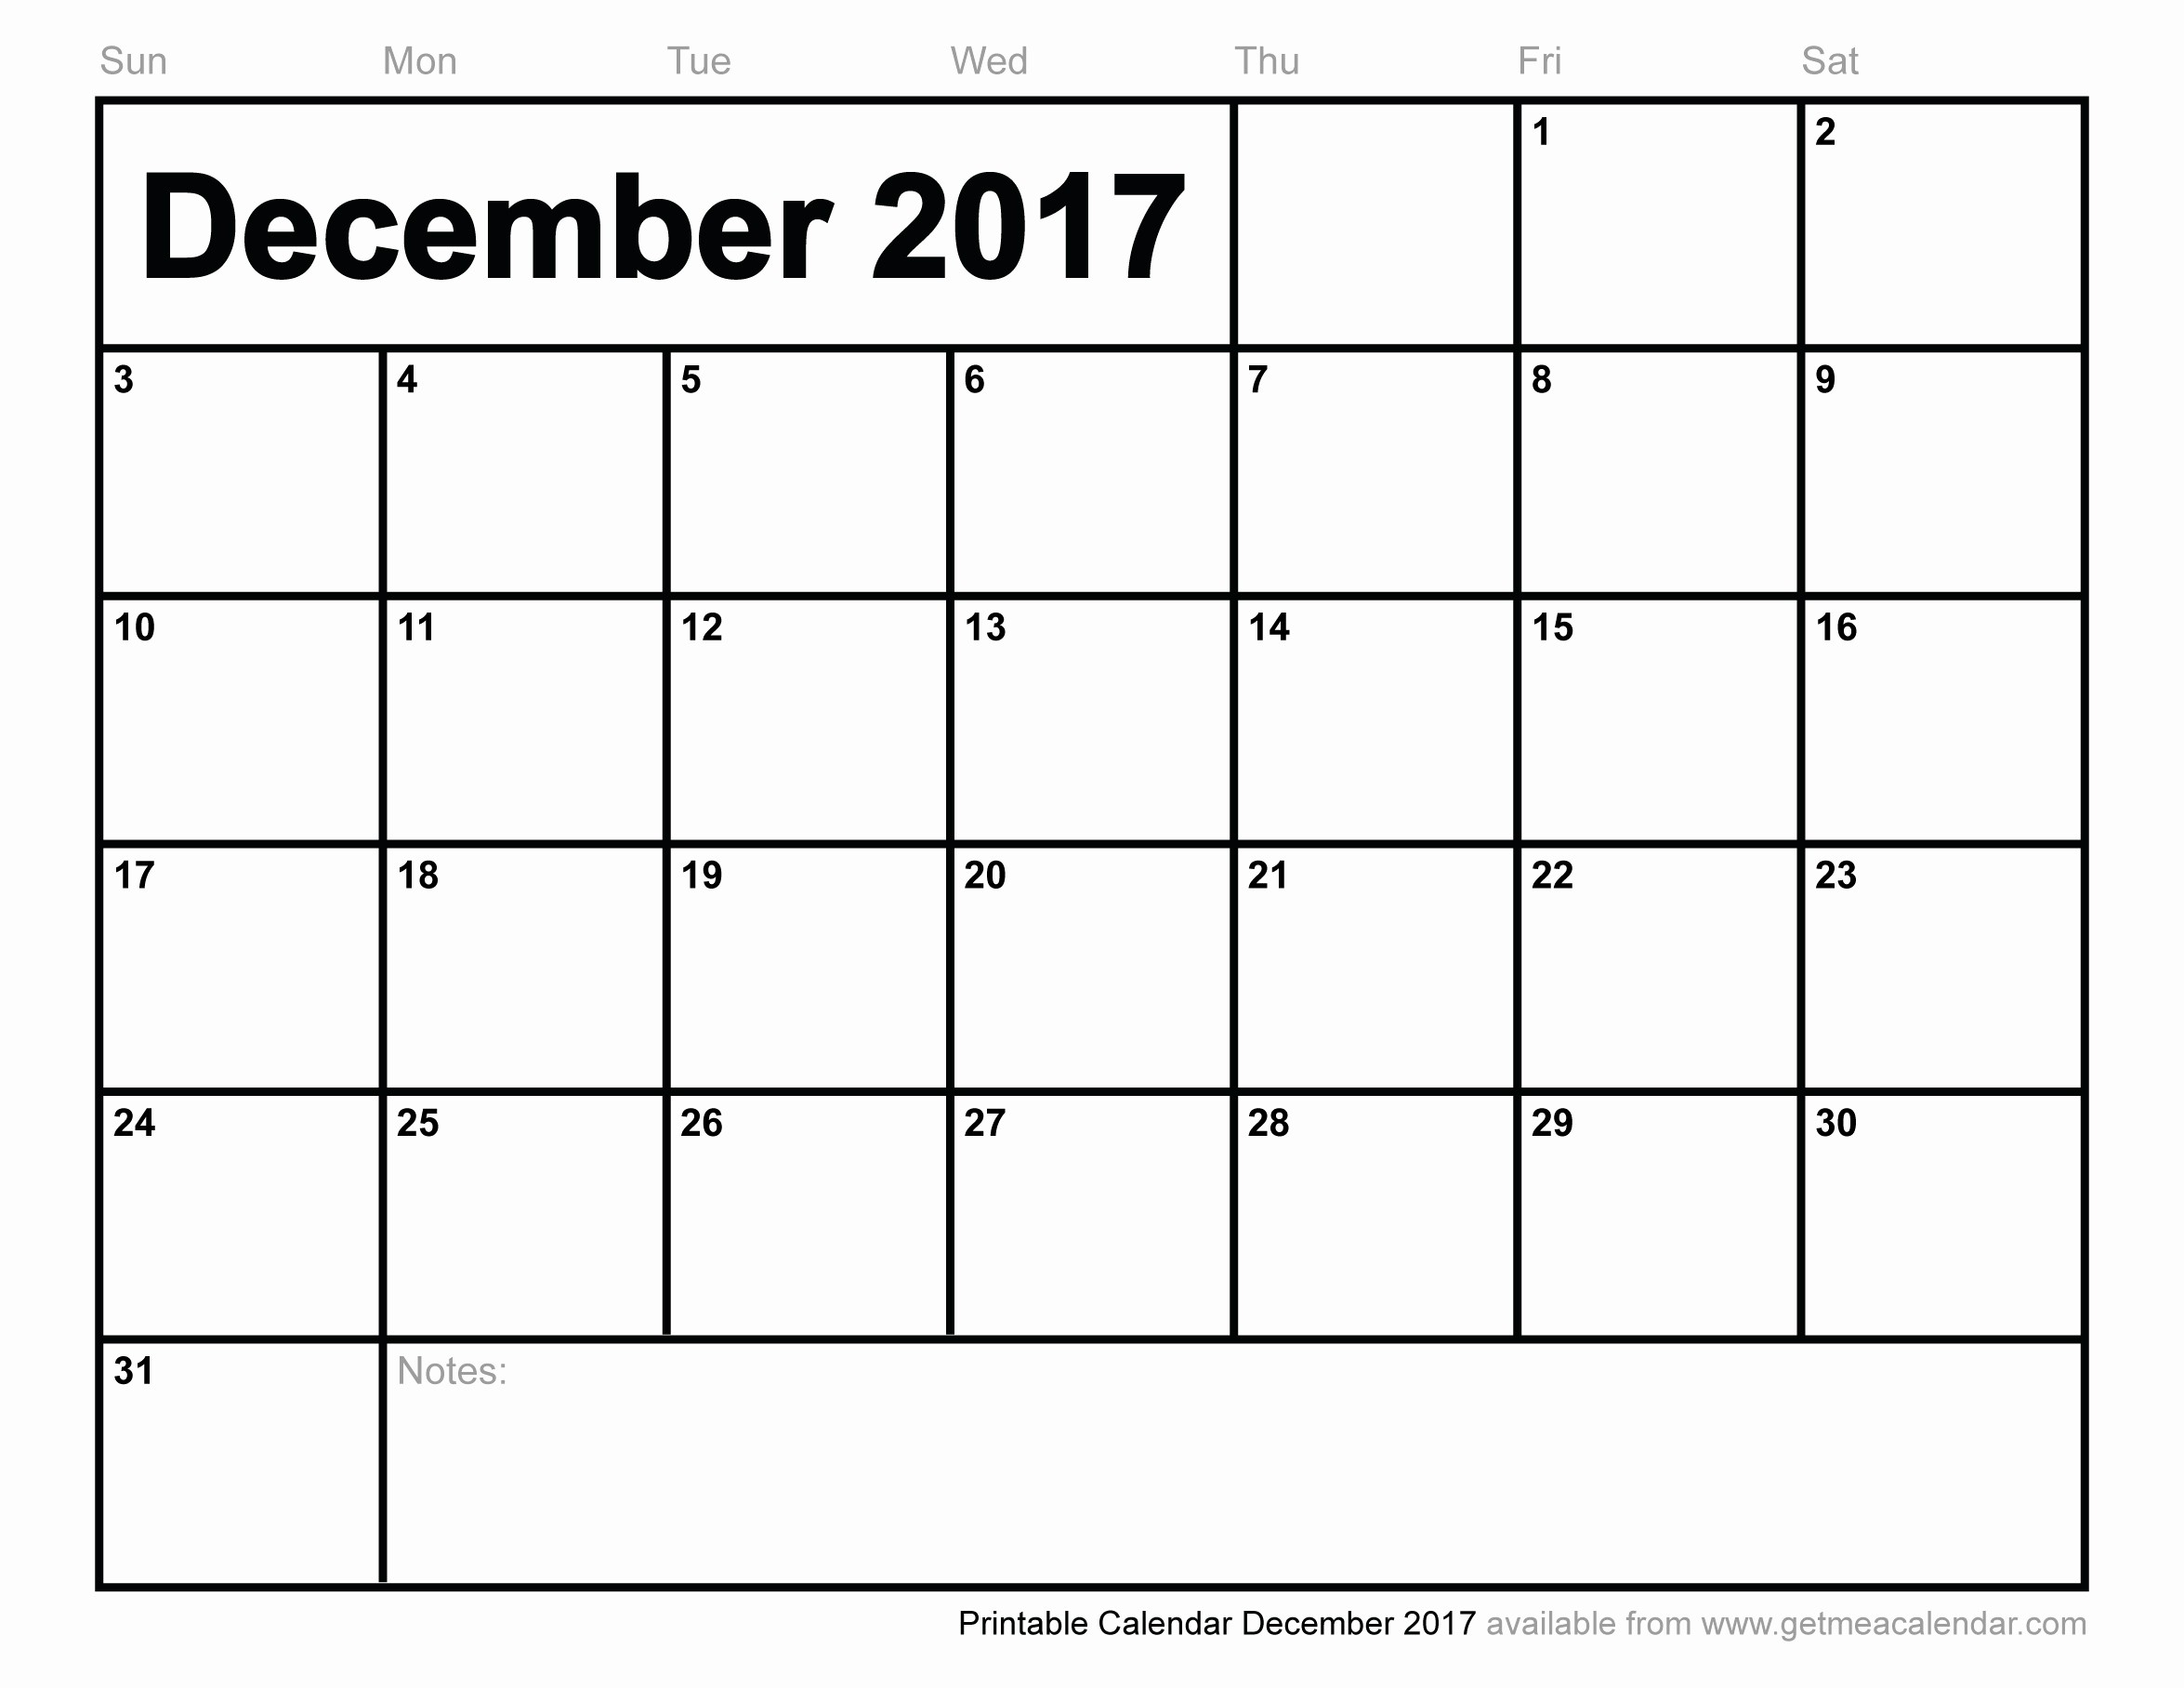 Free Editable Printable Calendar 2017 Luxury December 2017 Printable Calendar